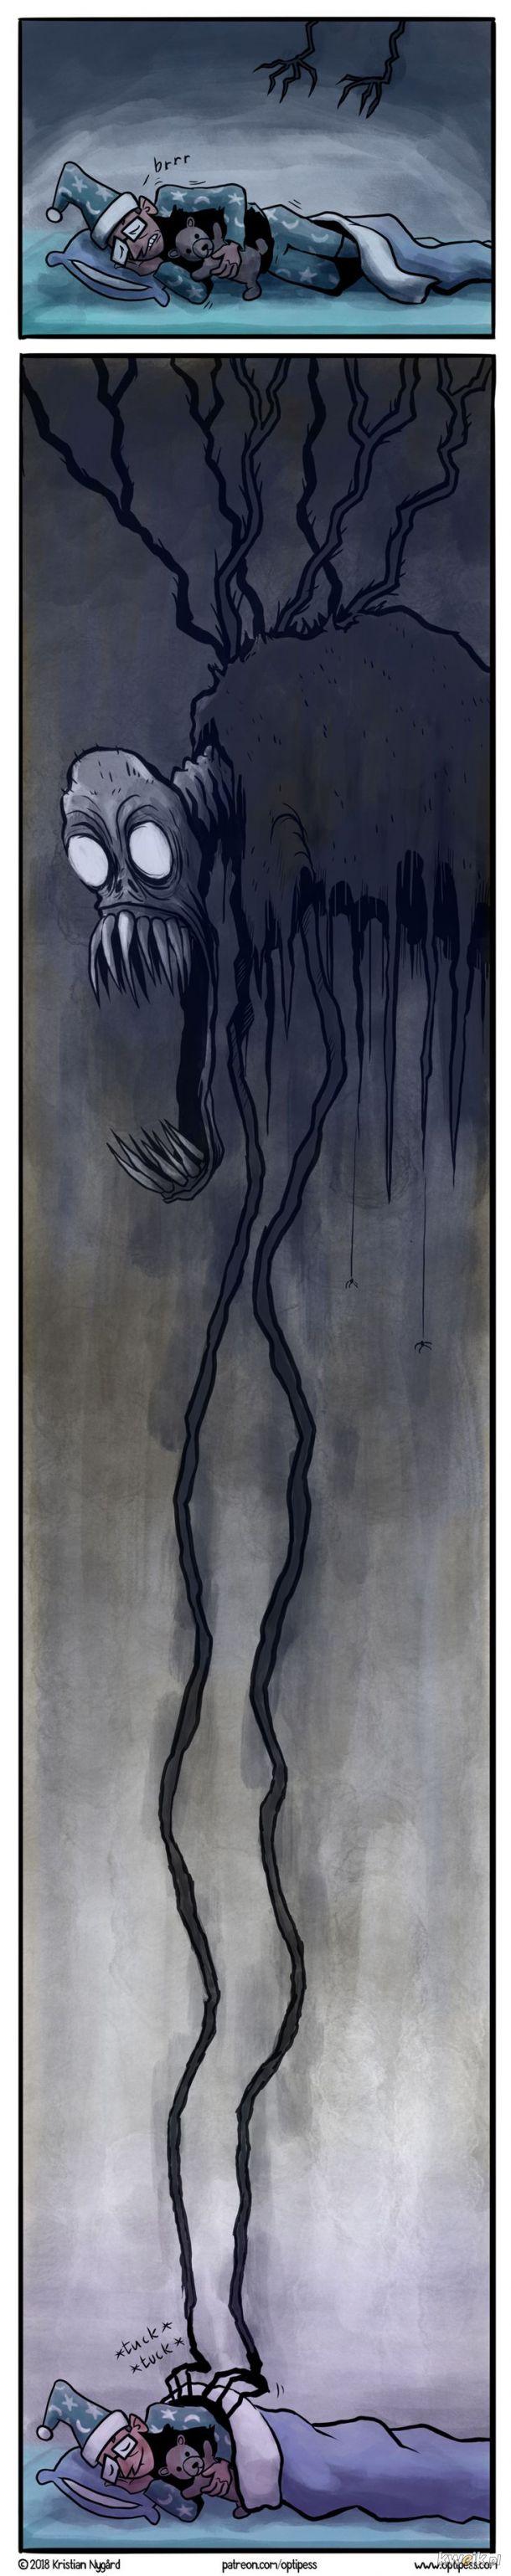 Potworny potwór